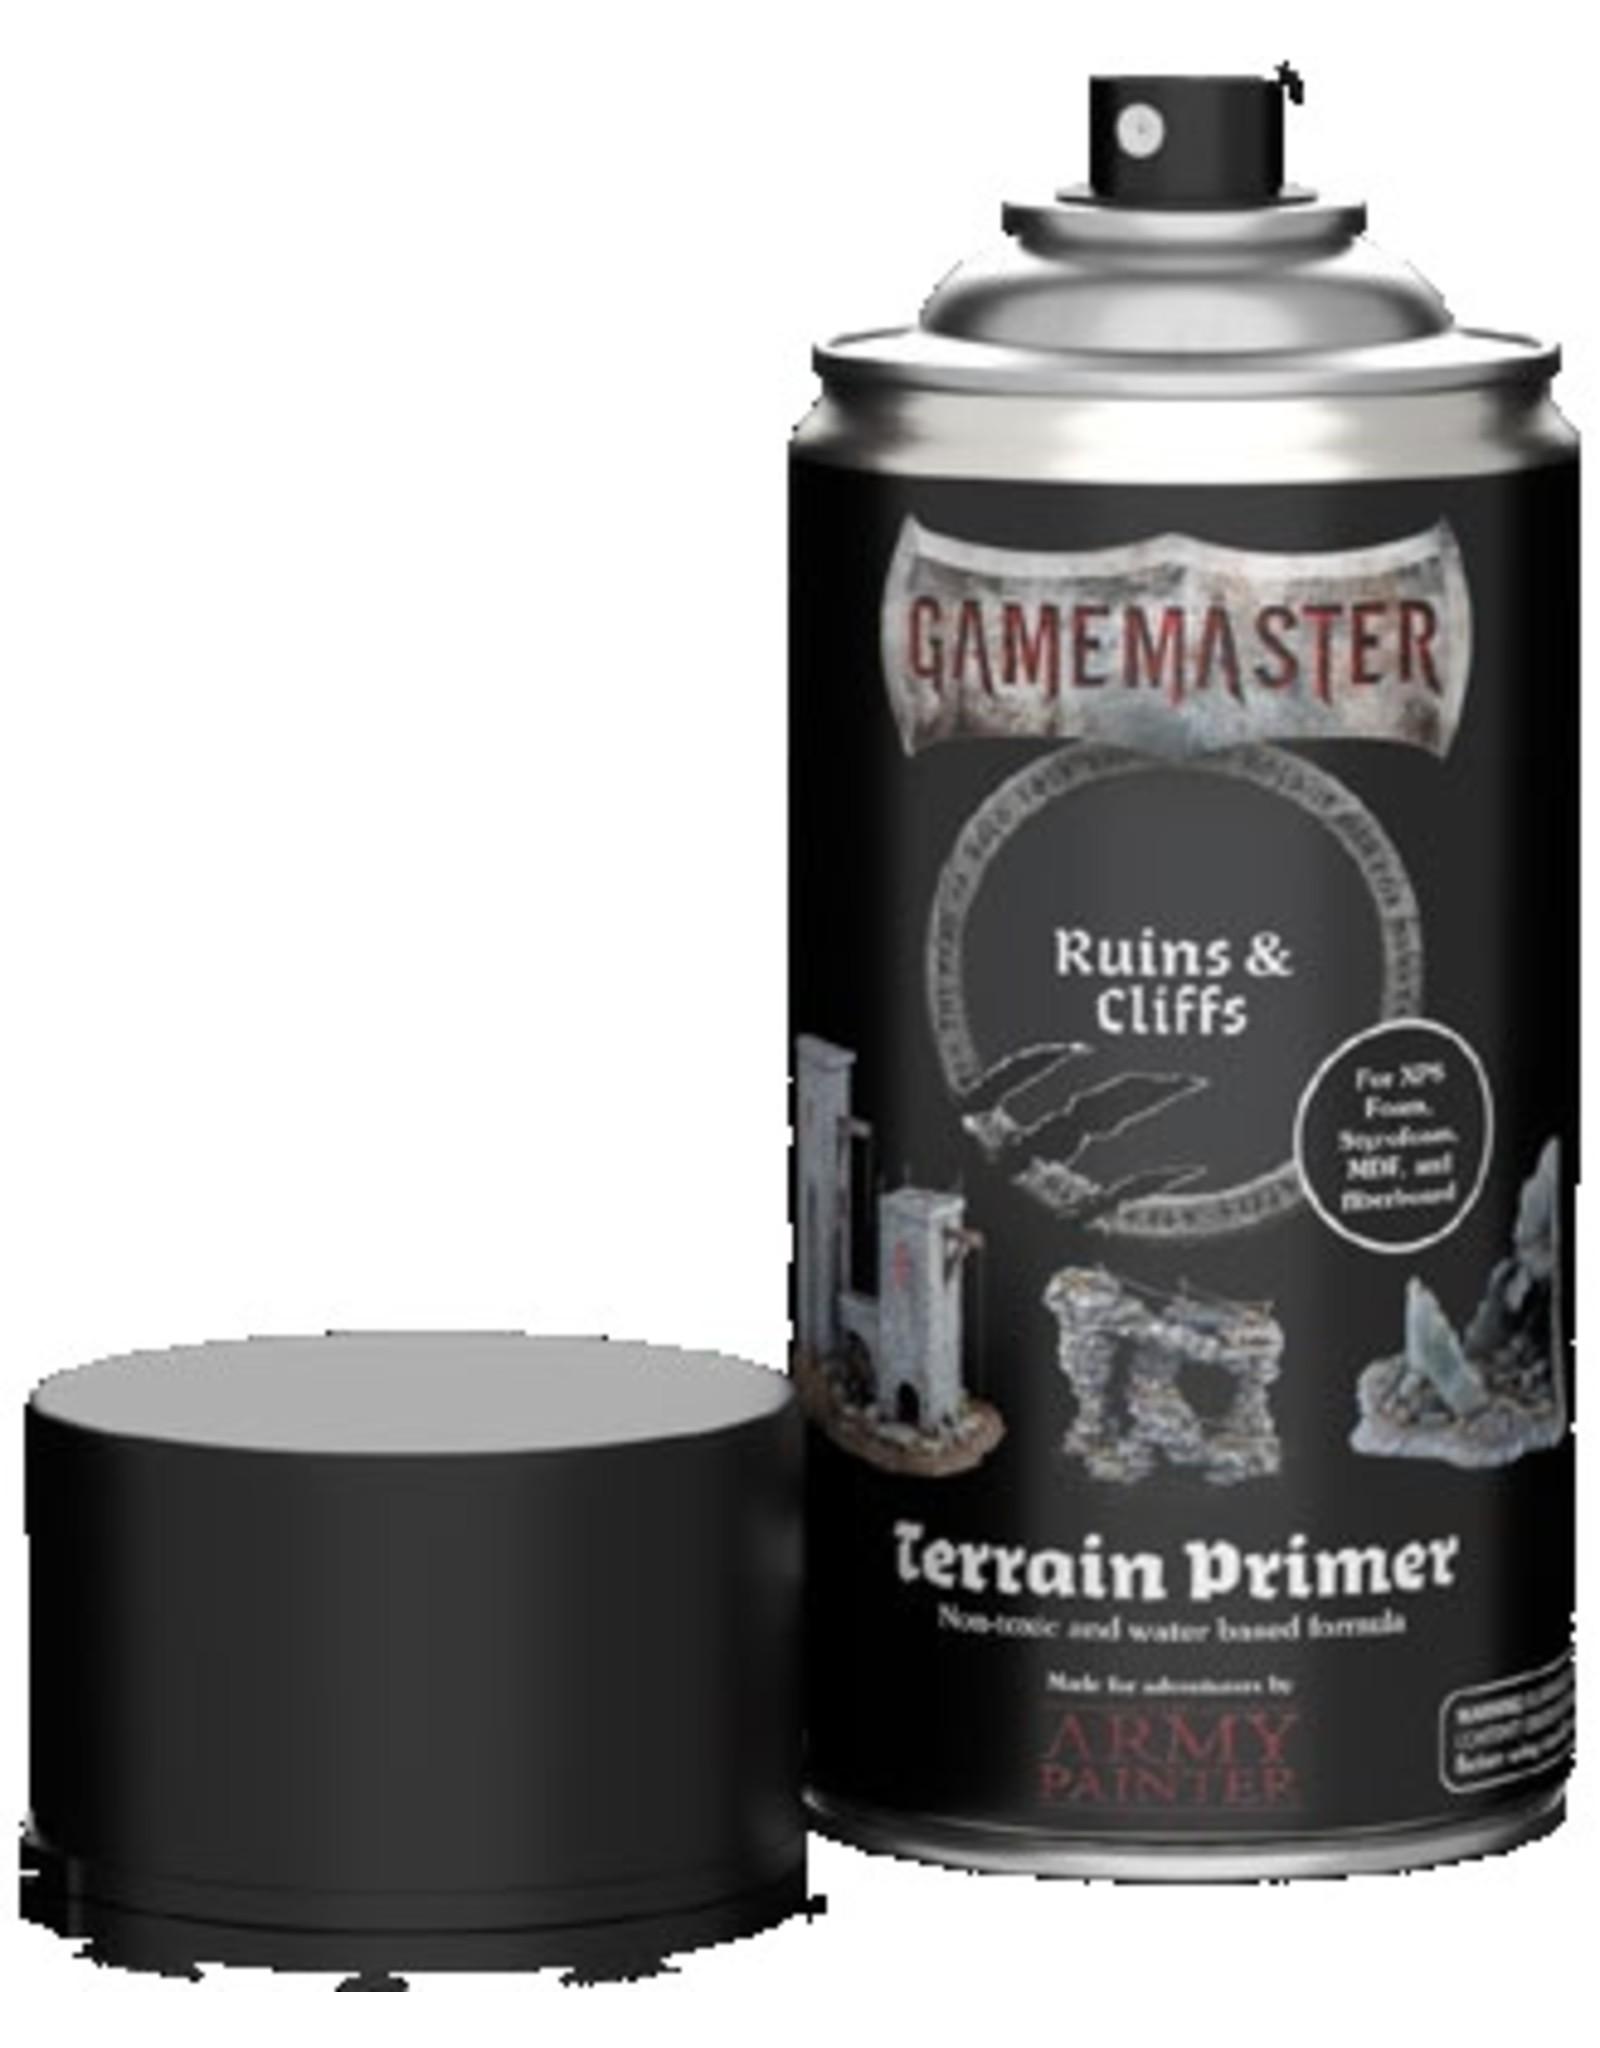 Army Painter Gamemaster: Terrain Primer: Ruins & Cliffs